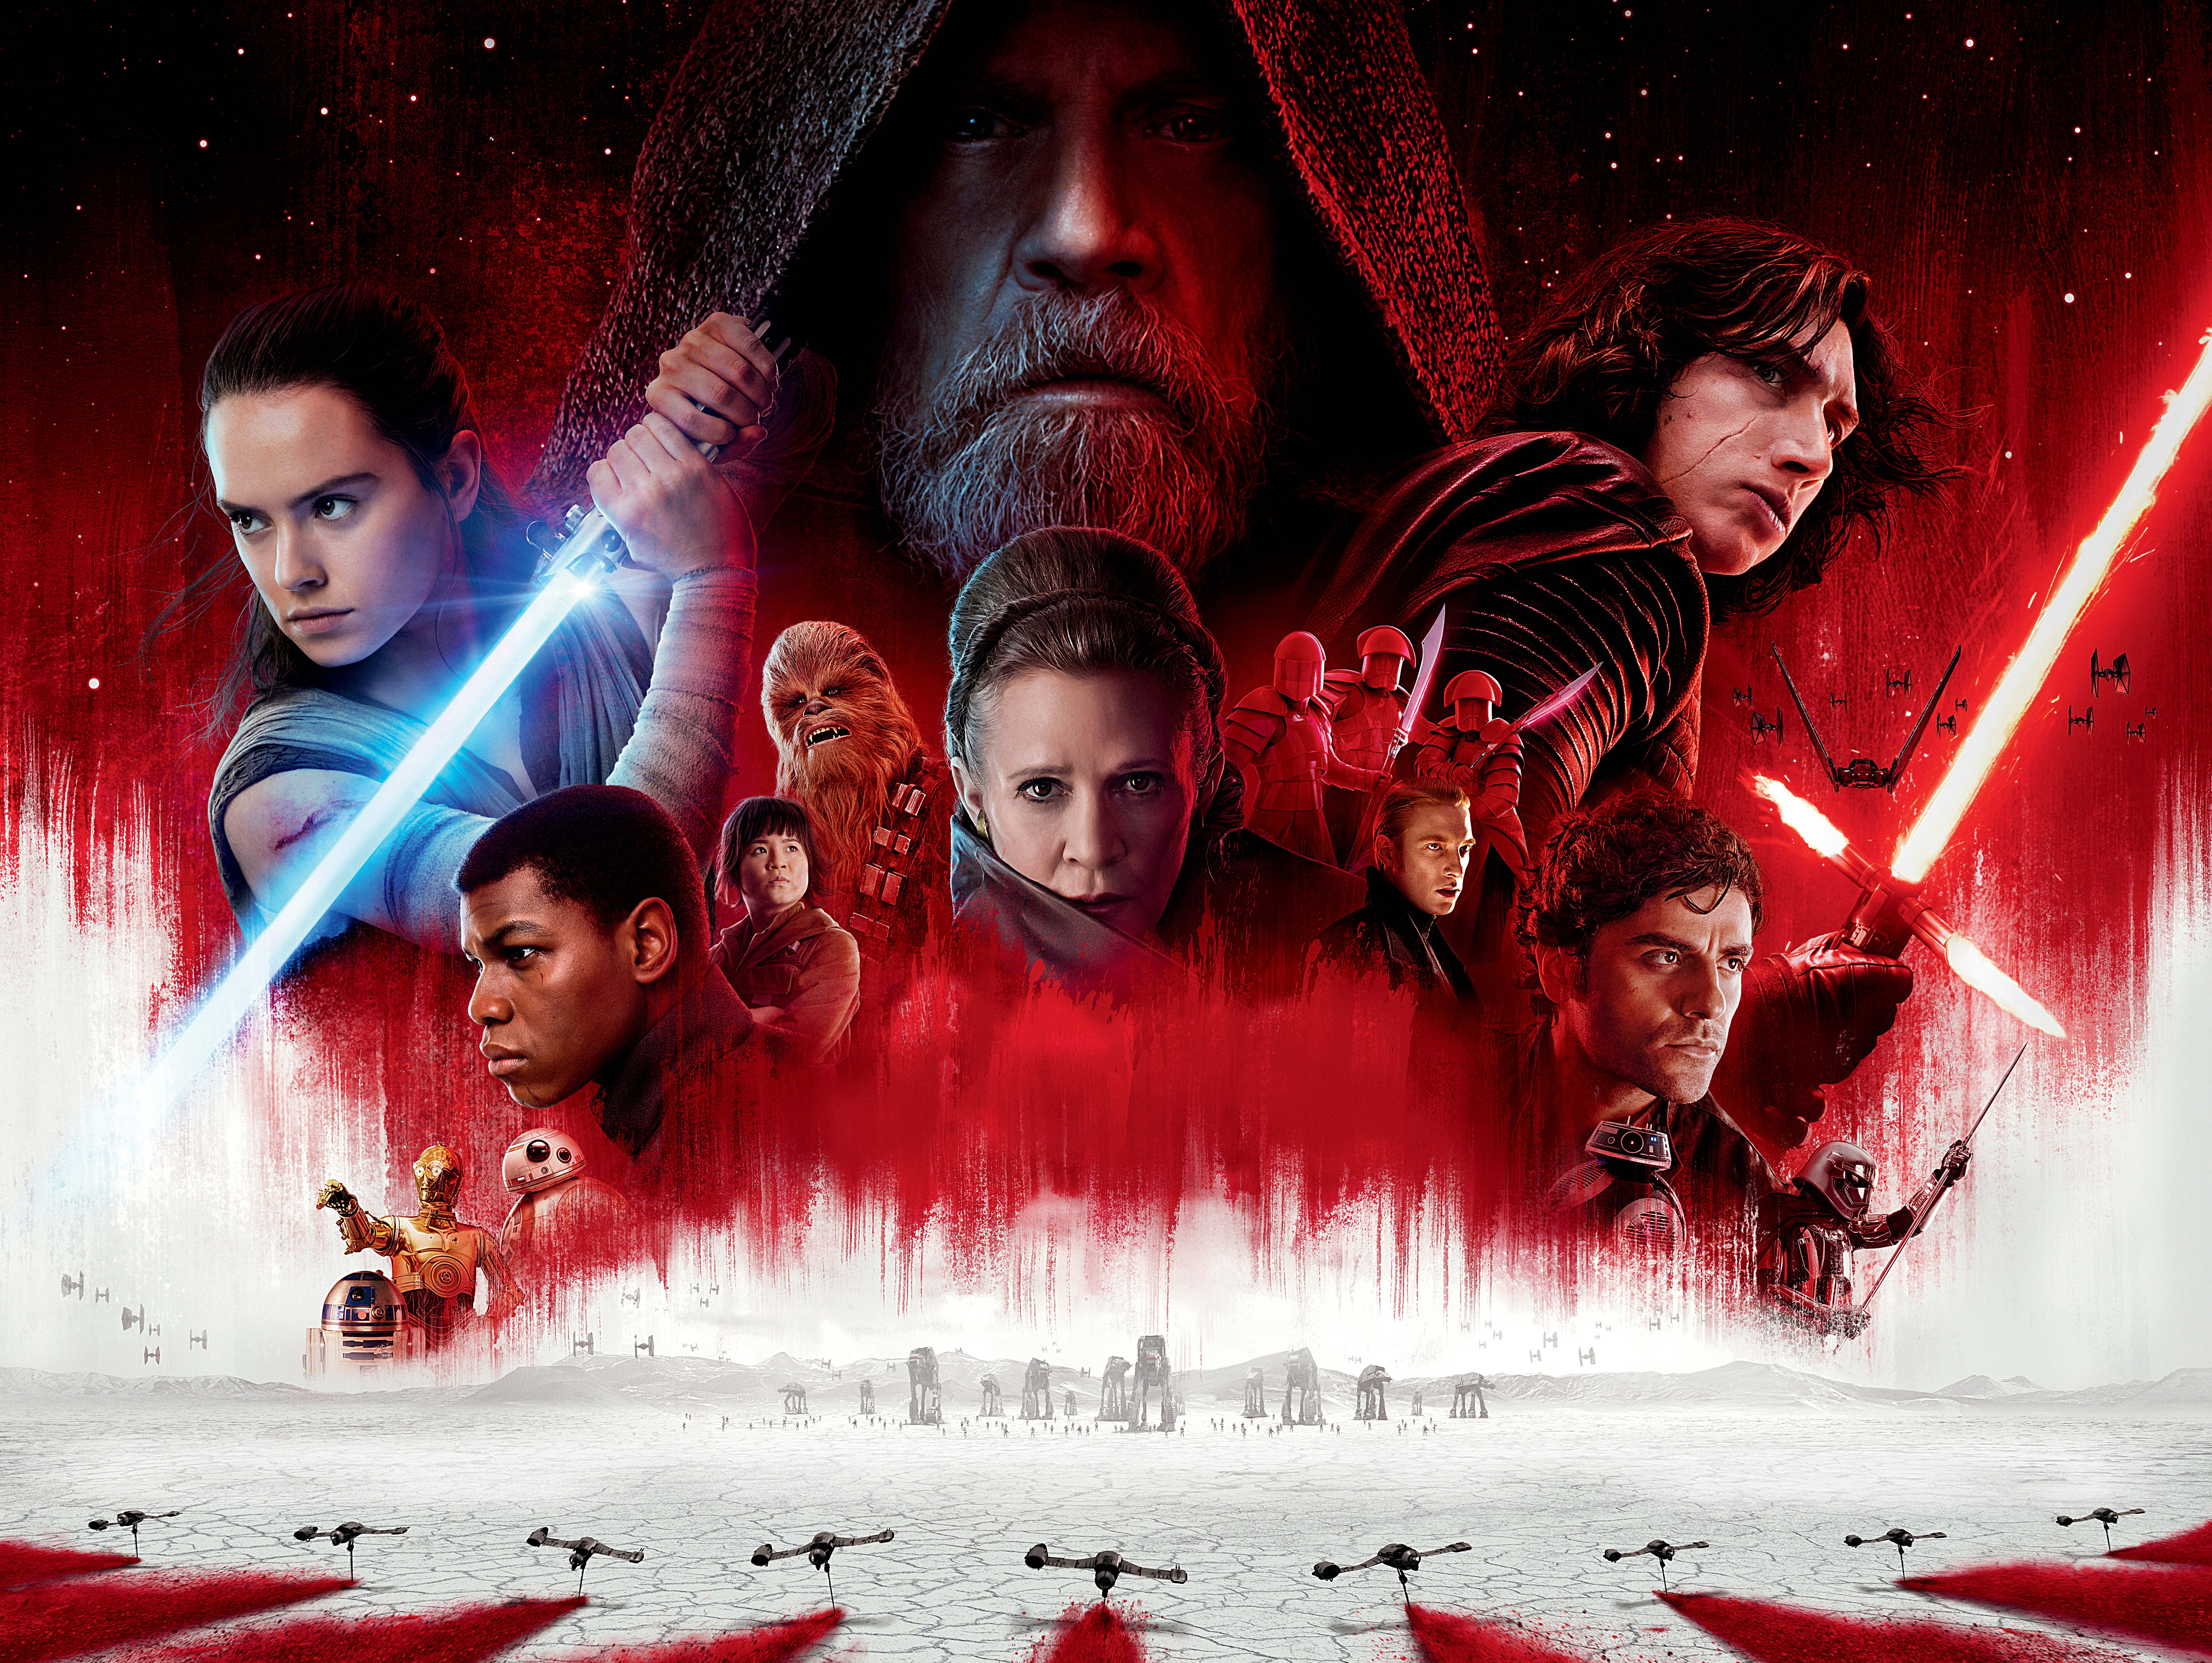 Star Wars The Last Jedi Desktop Wallpaper: 10k Star Wars The Last Jedi, HD Movies, 4k Wallpapers